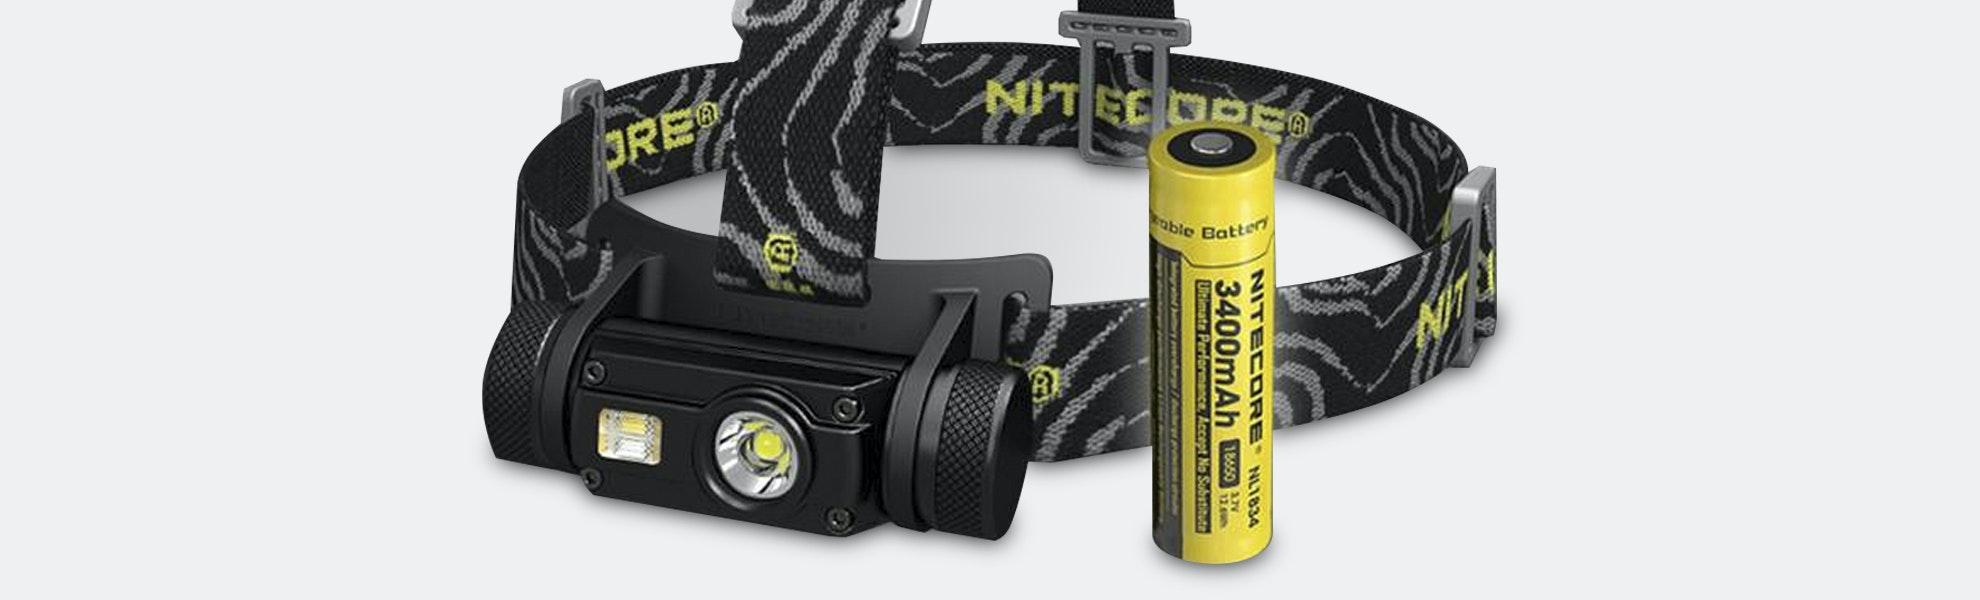 Nitecore HC65 1,000-Lumen Rechargeable Headlamp